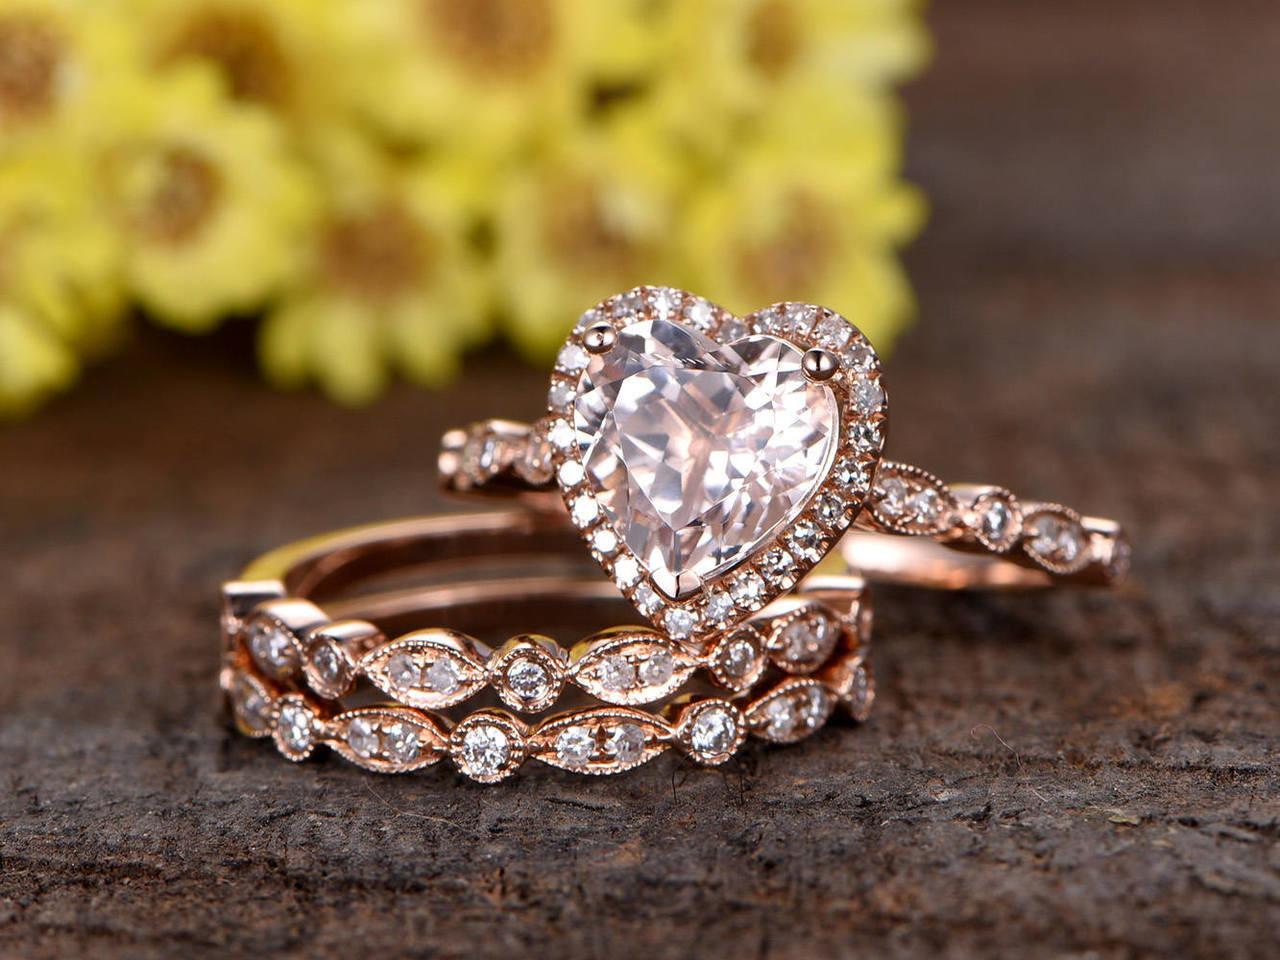 7mm Heart Shaped Pink Morganite Engagement Ring Set Half Eternity